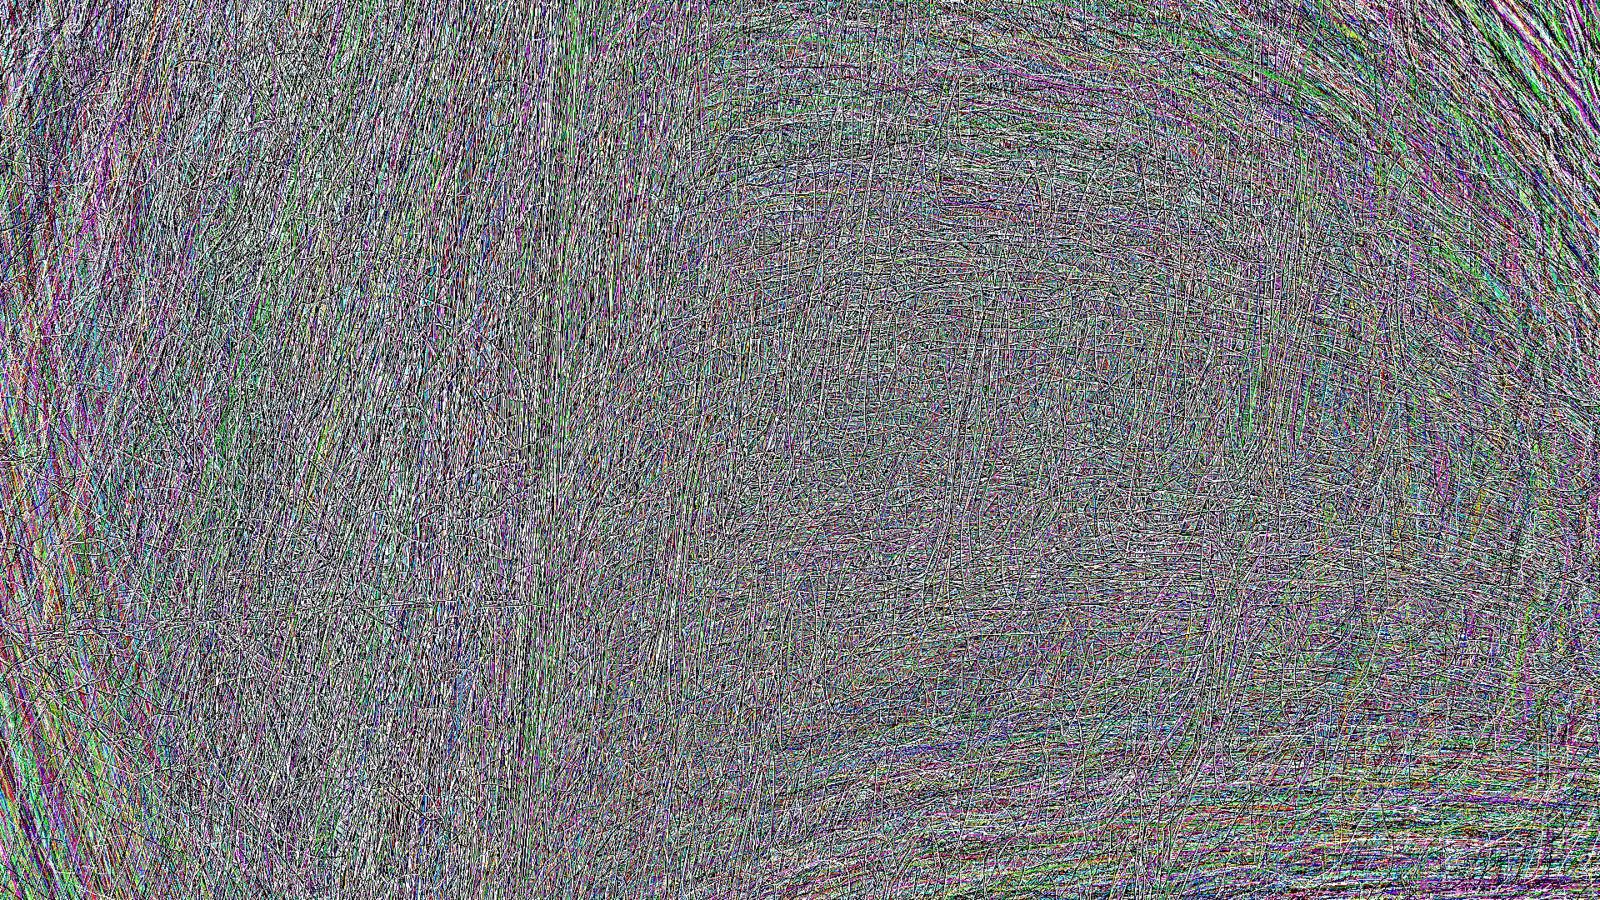 18.06.25-Main Output-15.05.01.png